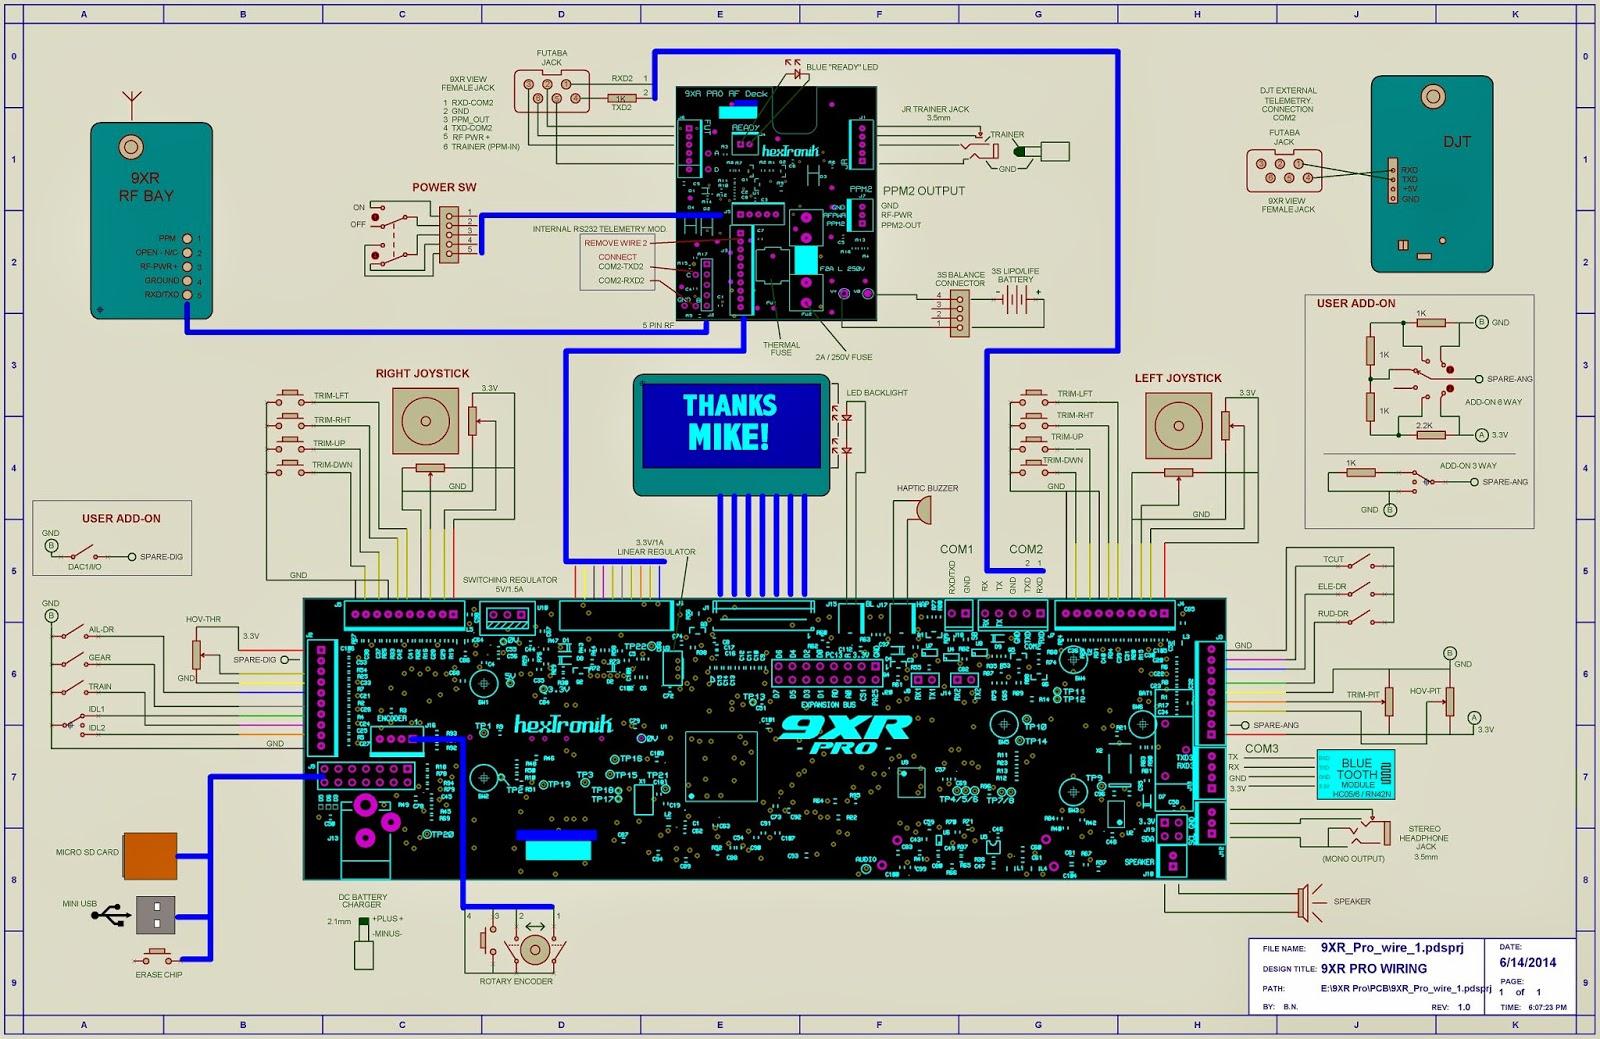 9xr pro wiring diagram [ 1600 x 1039 Pixel ]